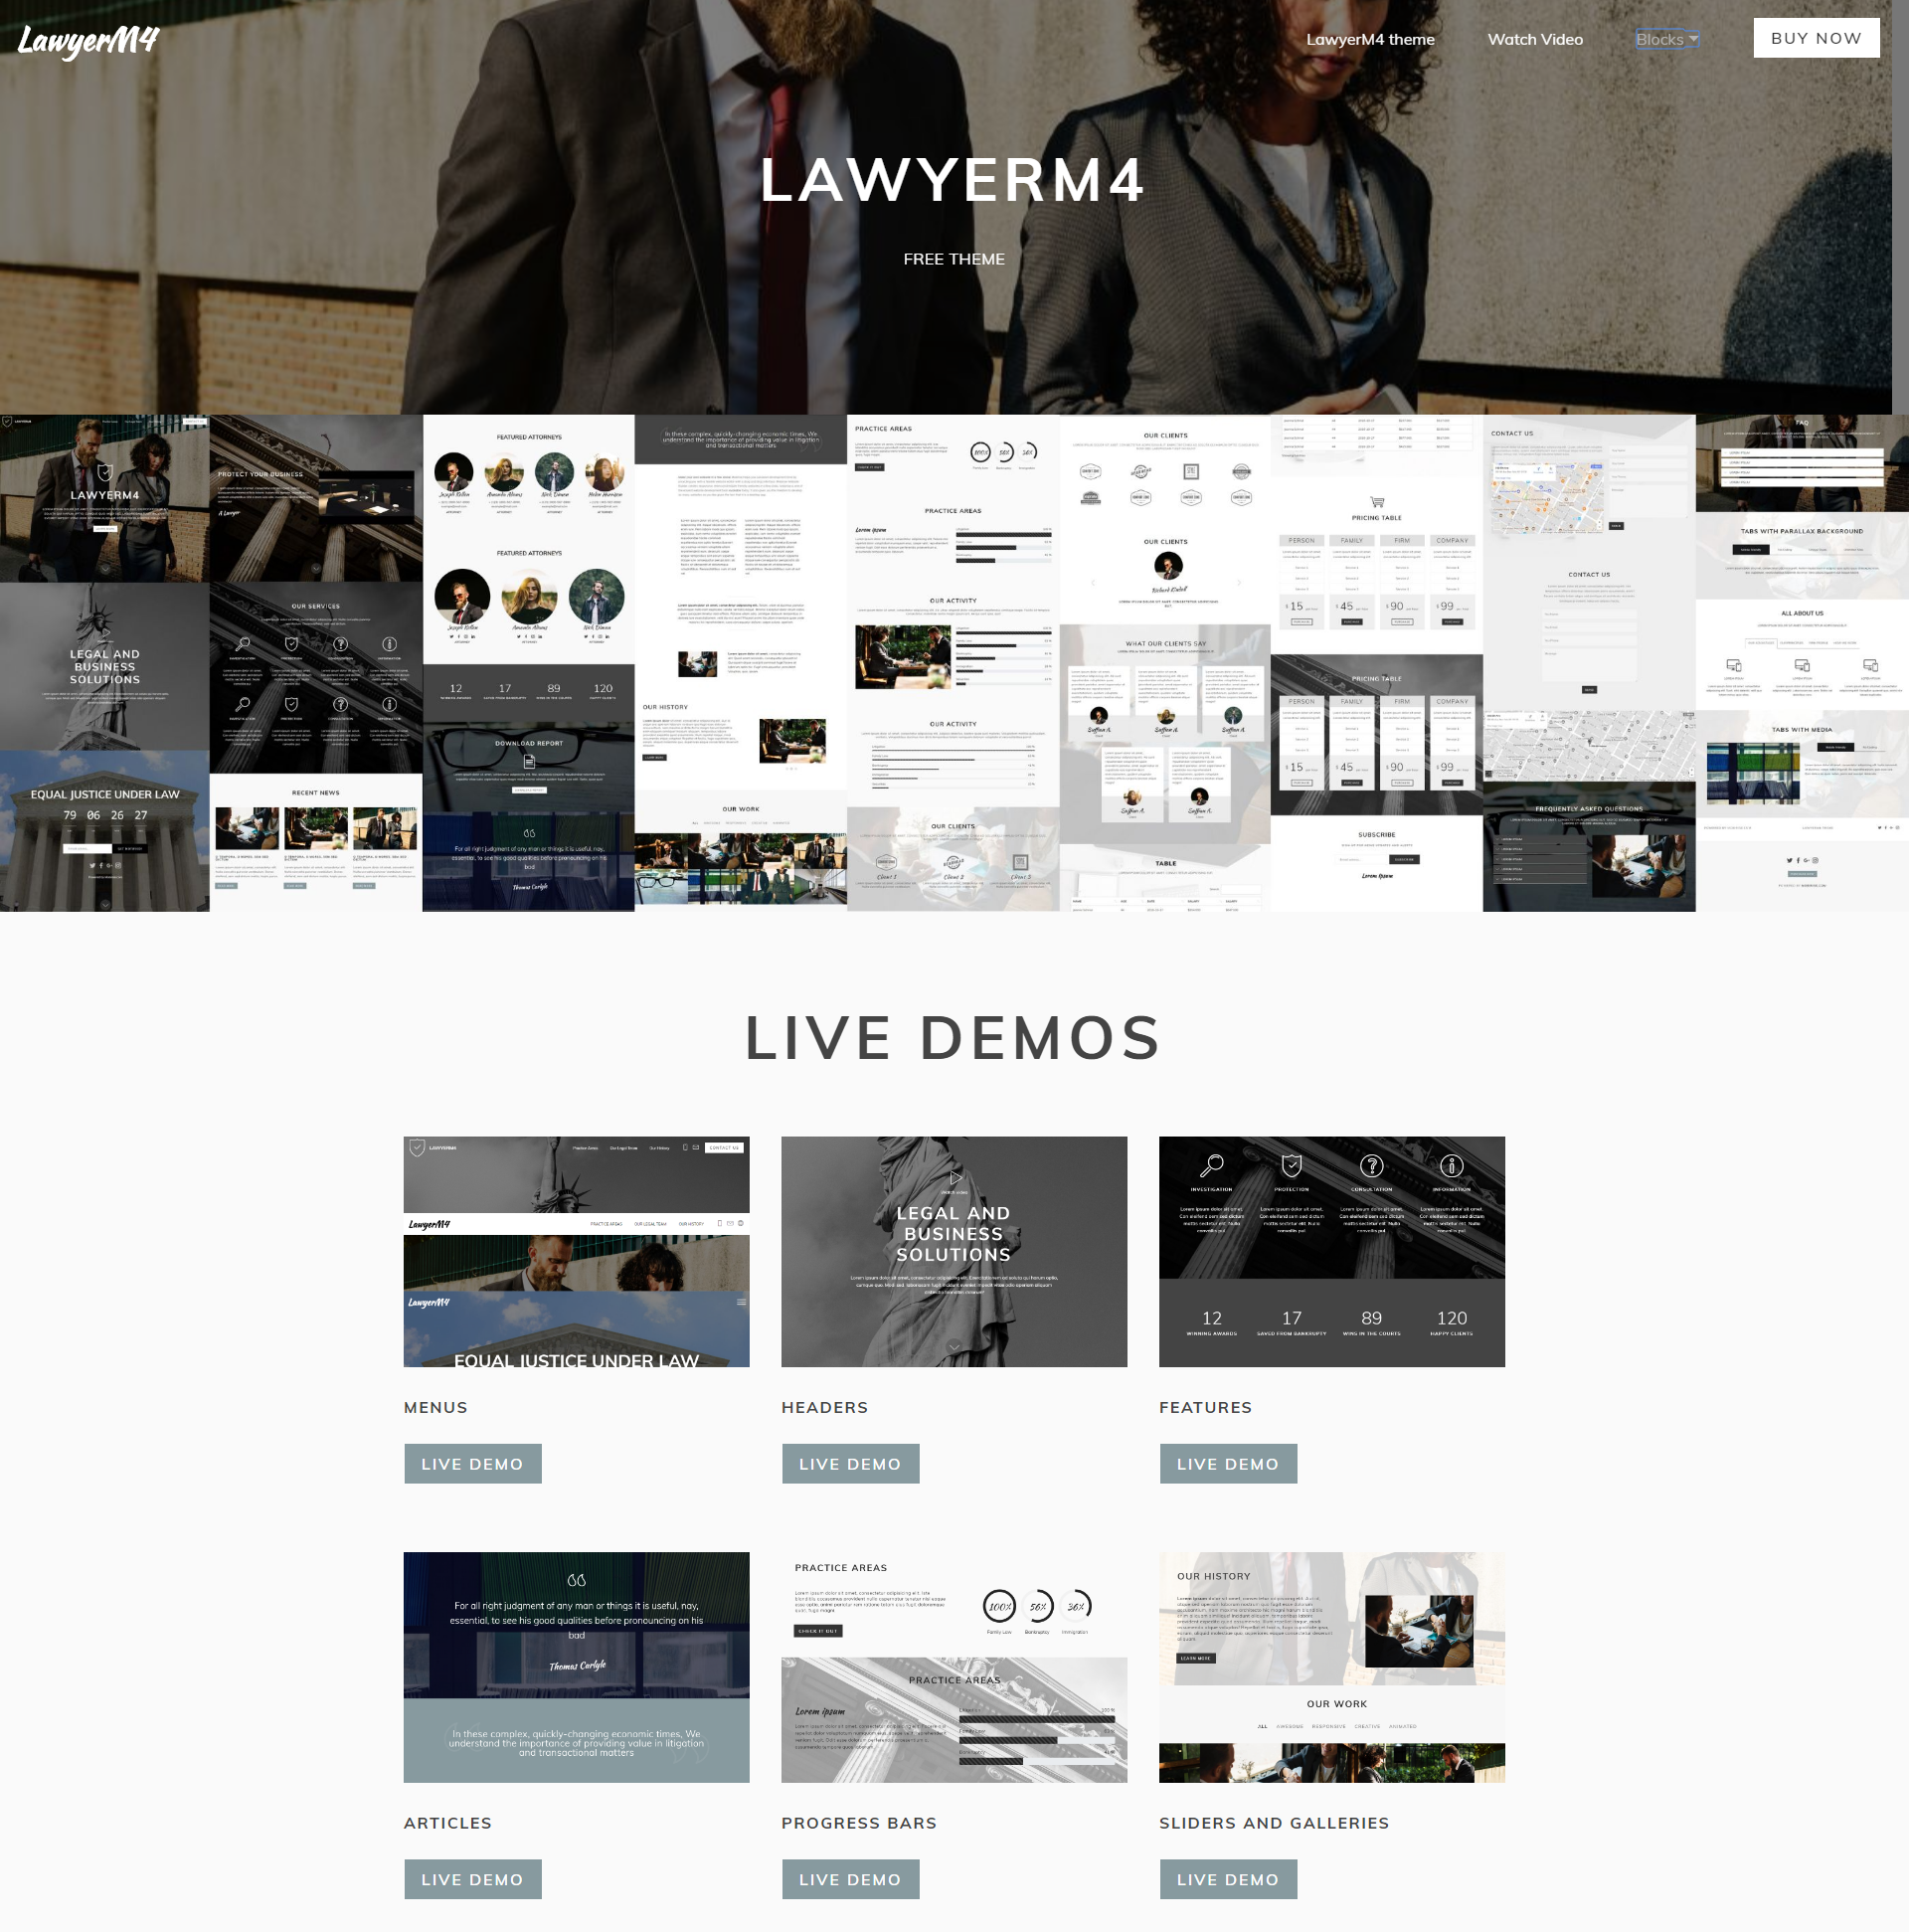 HTML Bootstrap LawyerM4 Themes